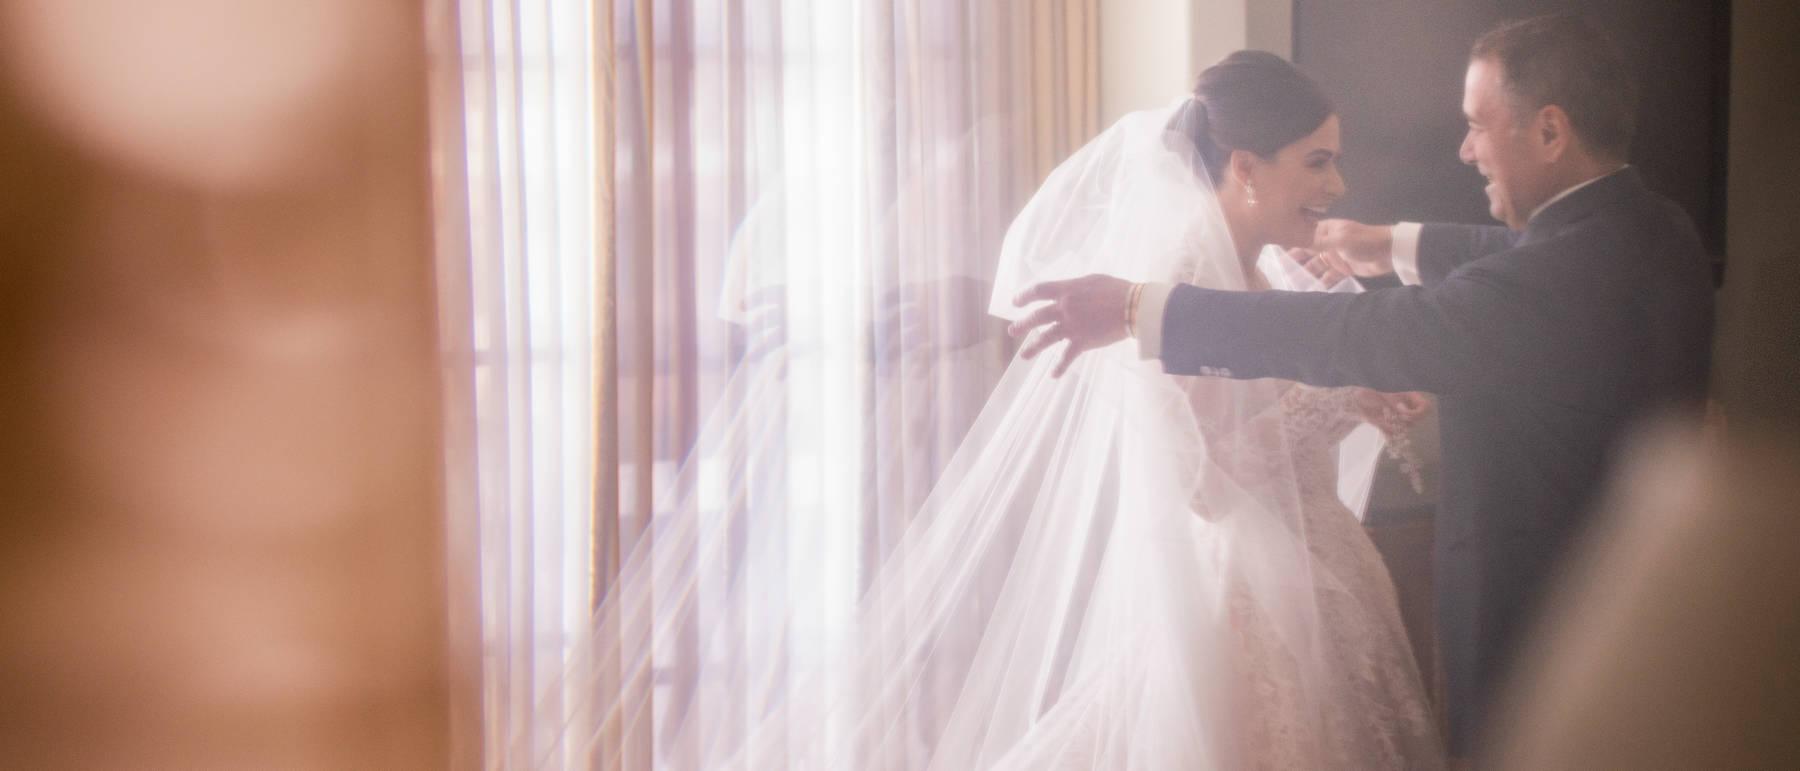 johnandjoseph-wedding-photographer-hz-slider-139